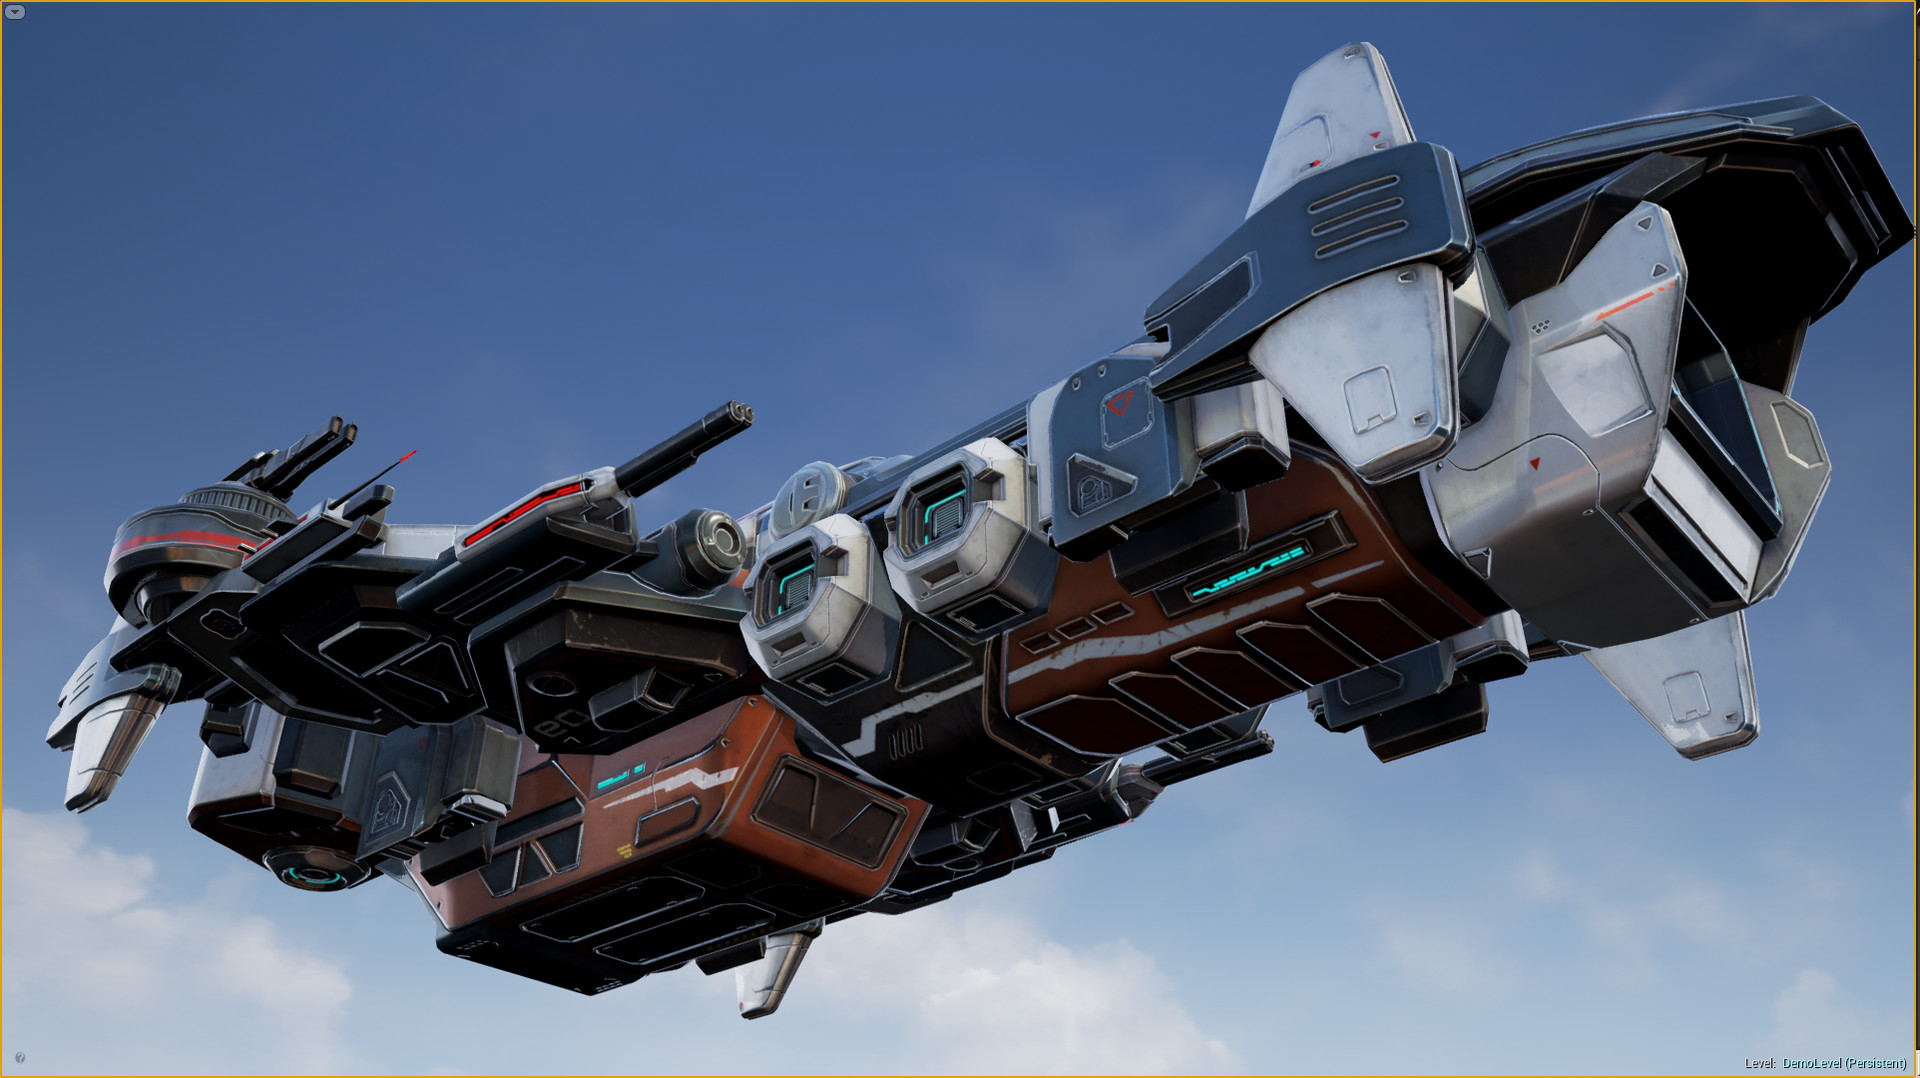 Spaceship Nemesis